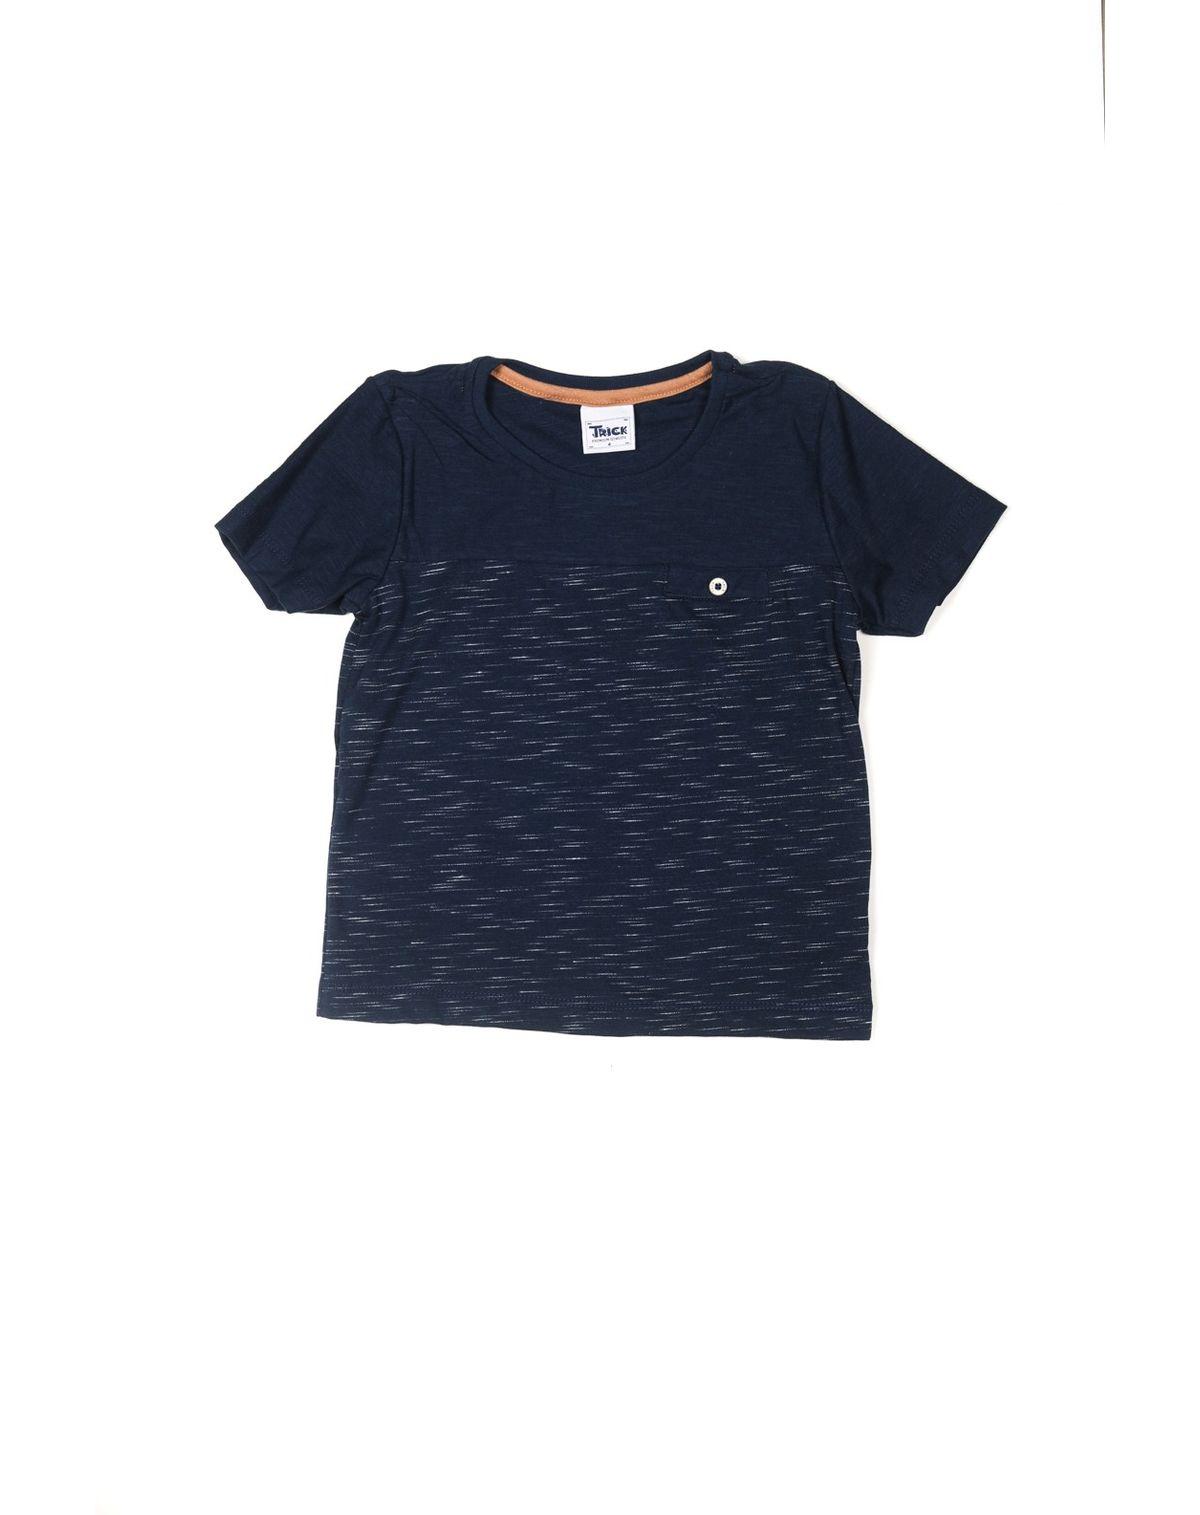 2050005861487-Camiseta-Manga-Curta-Infantil-Menino-Recortes-Rajado-MARINHO-8-1